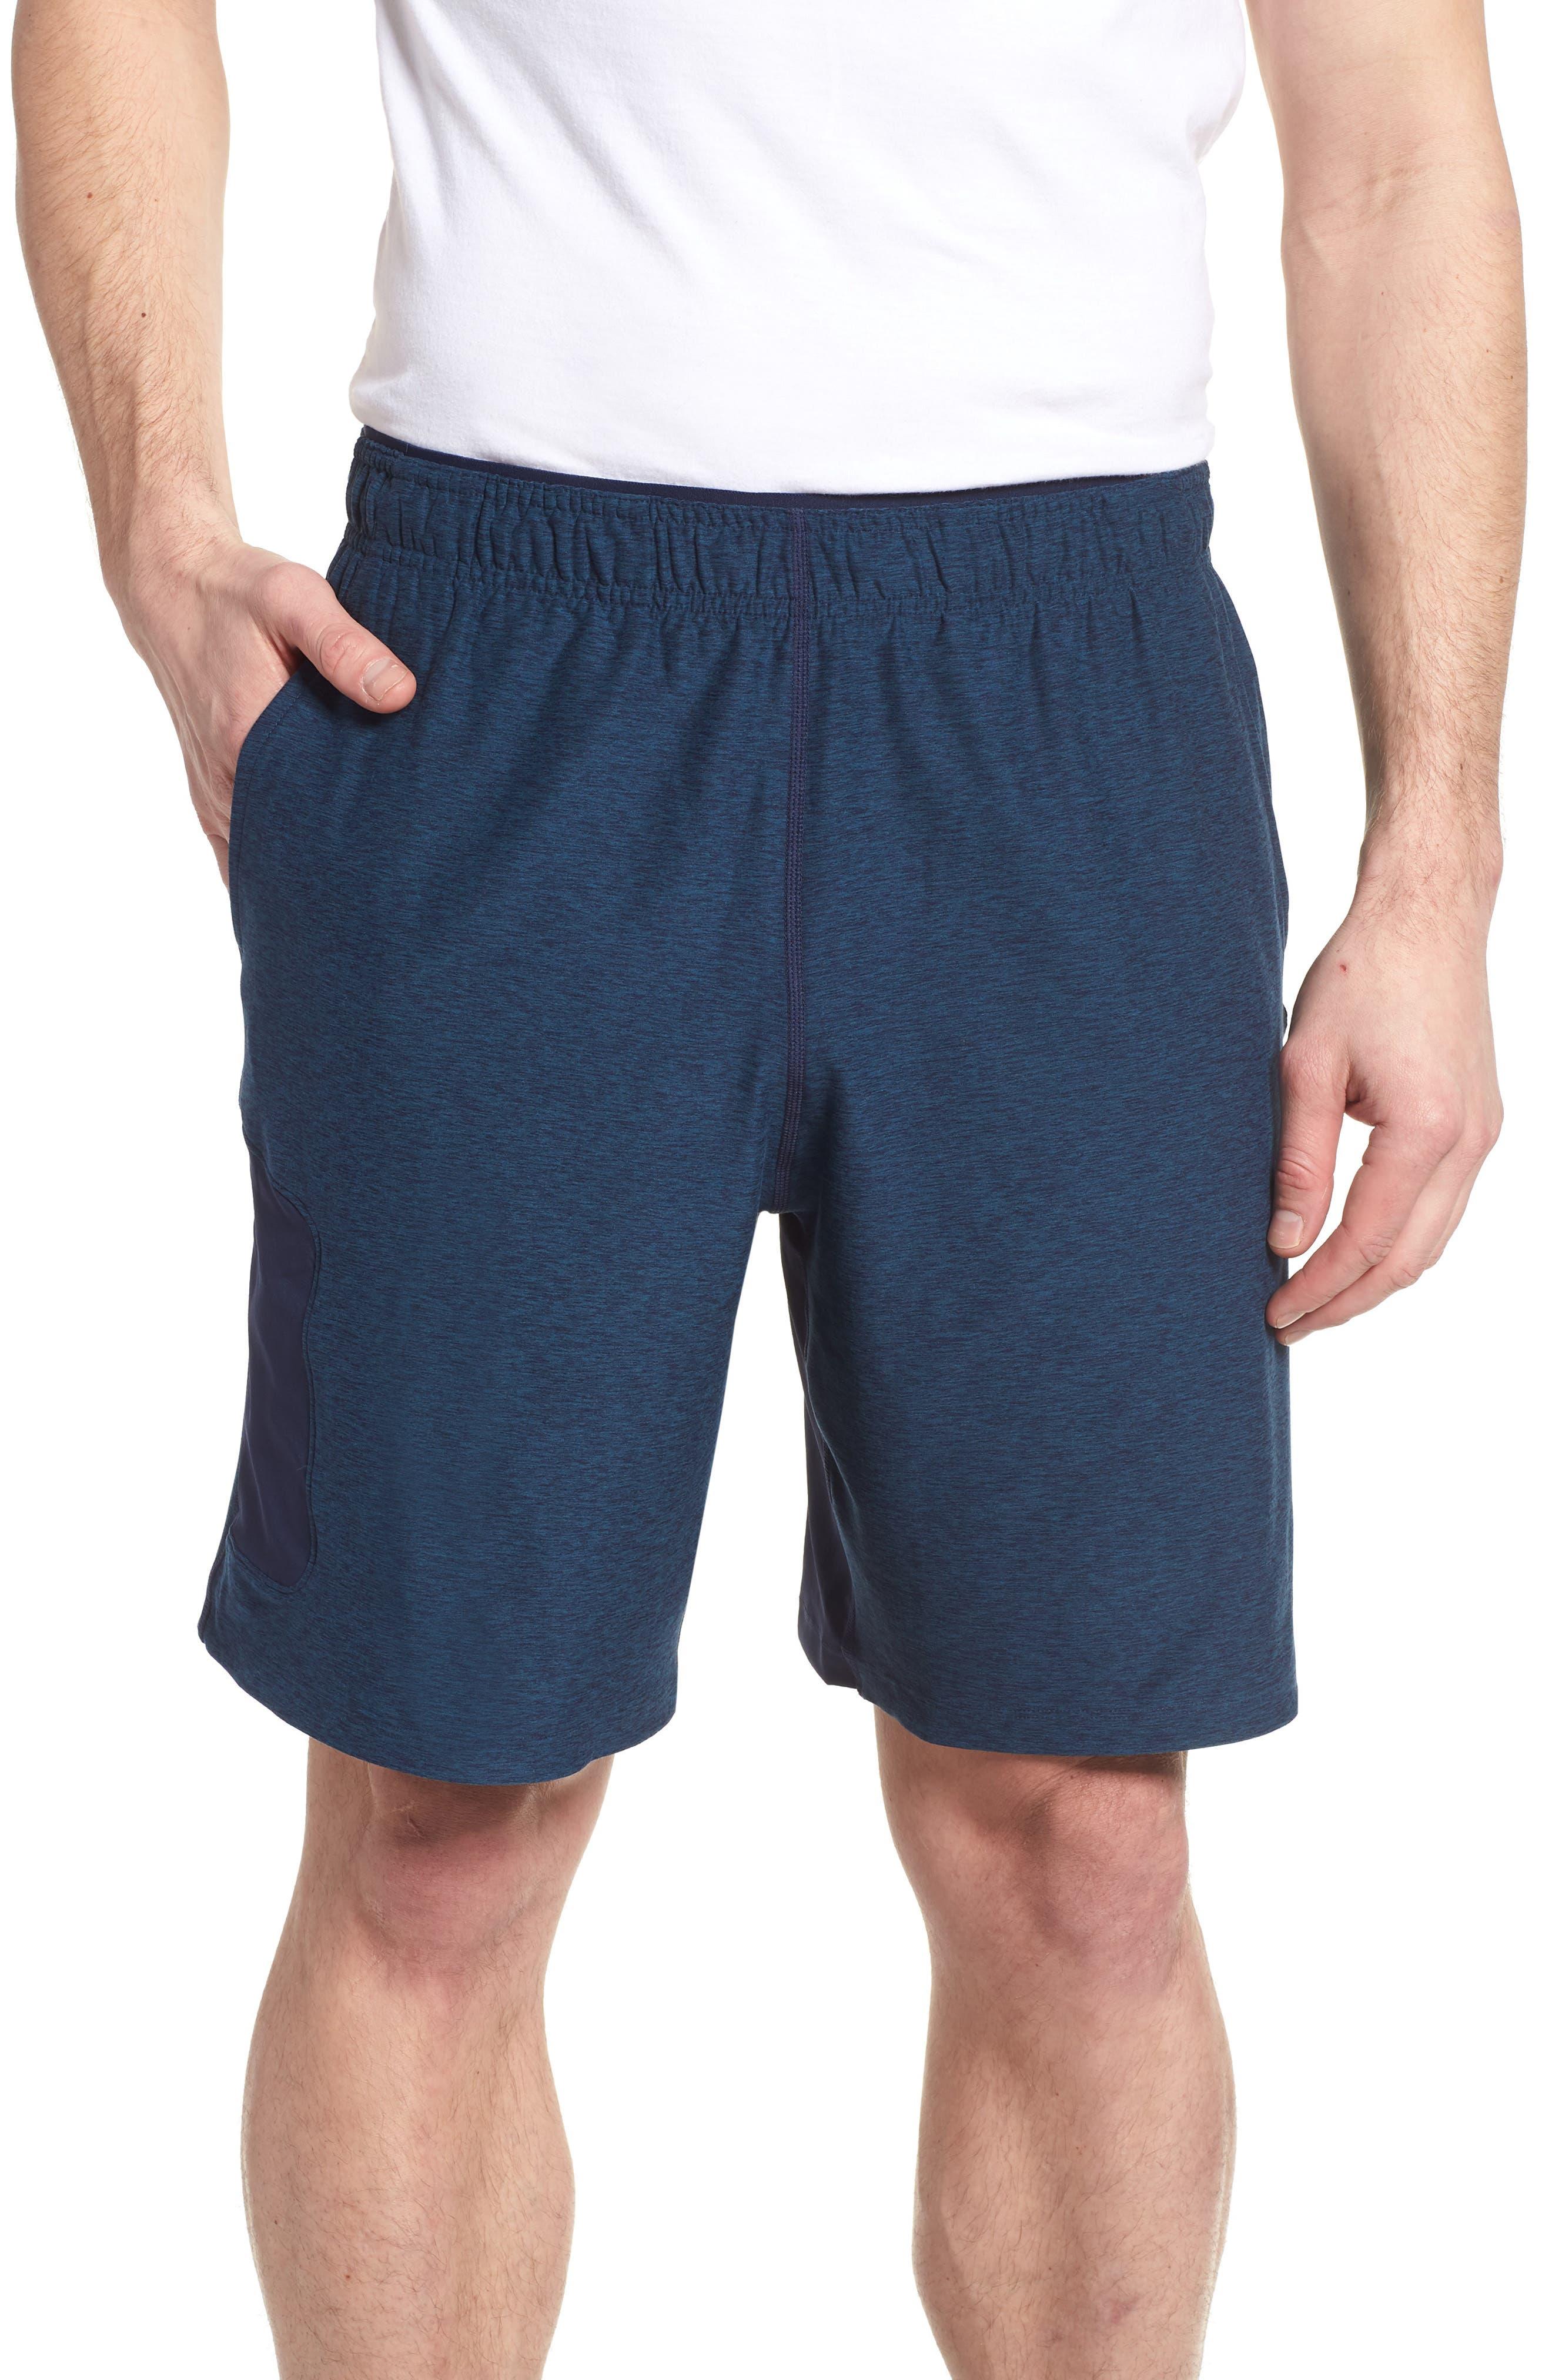 Anticipate Shorts,                             Main thumbnail 1, color,                             Pigment